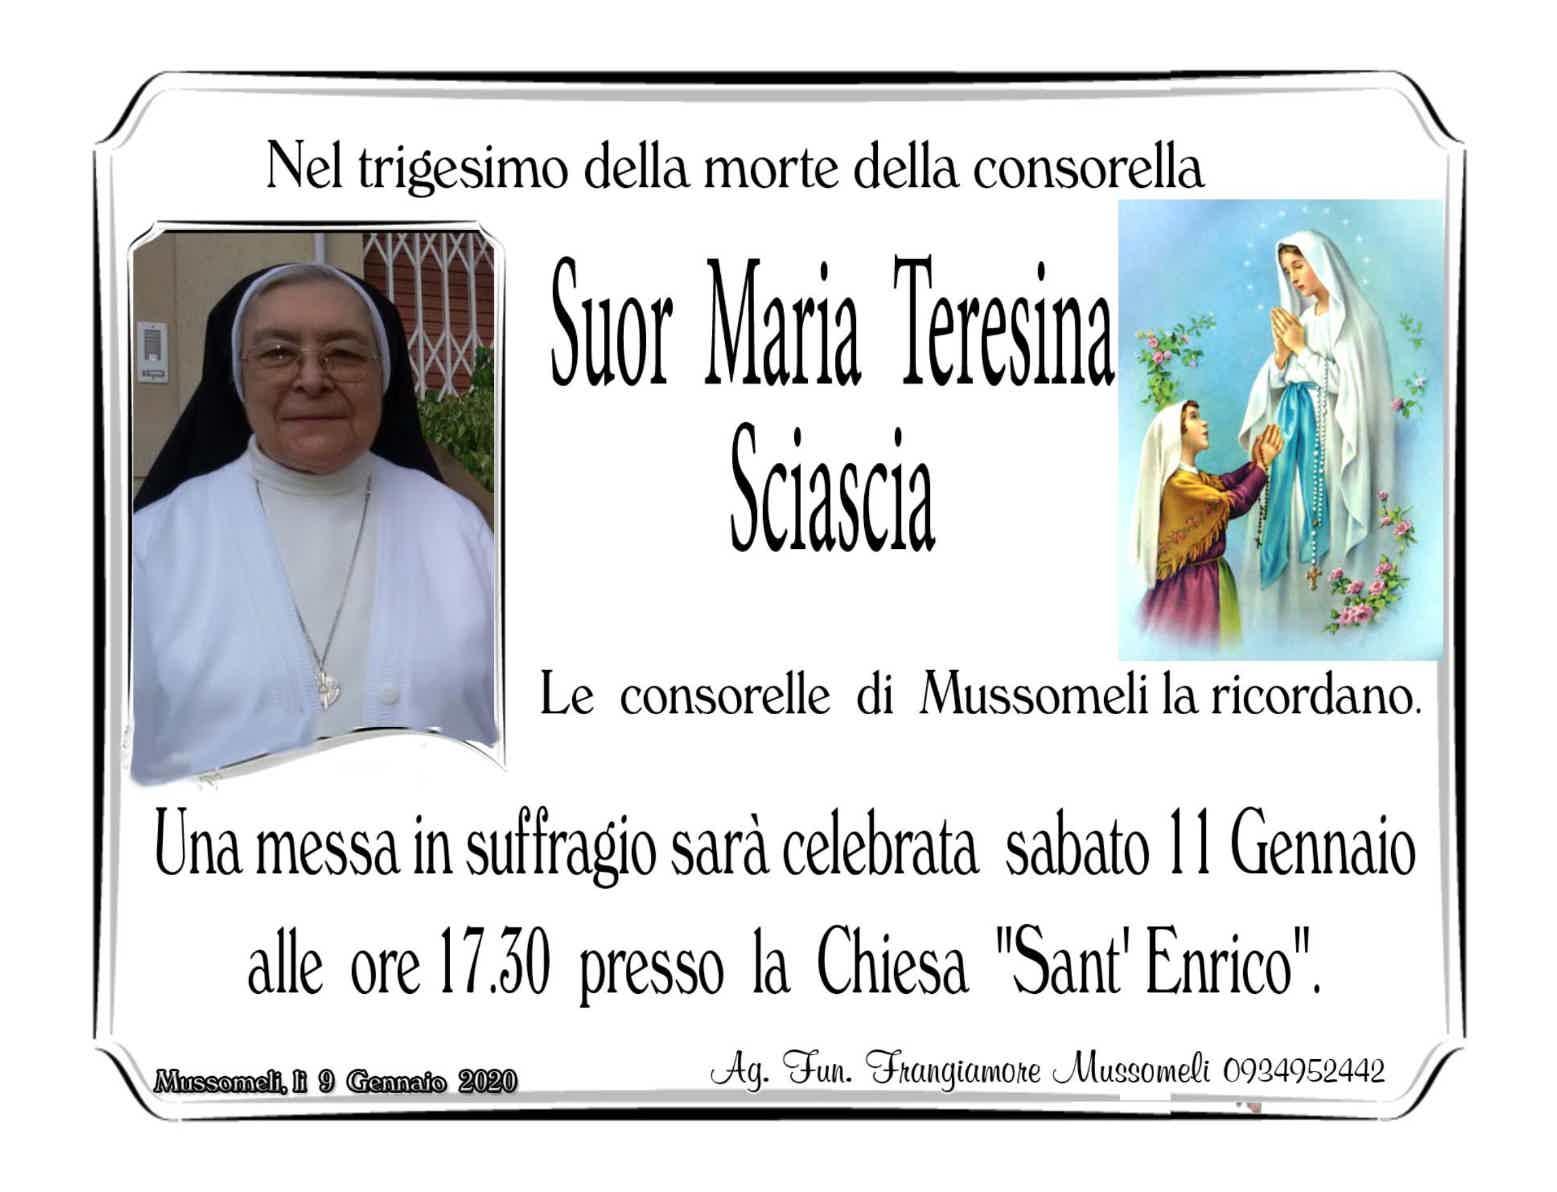 Suor Maria Teresina Sciascia